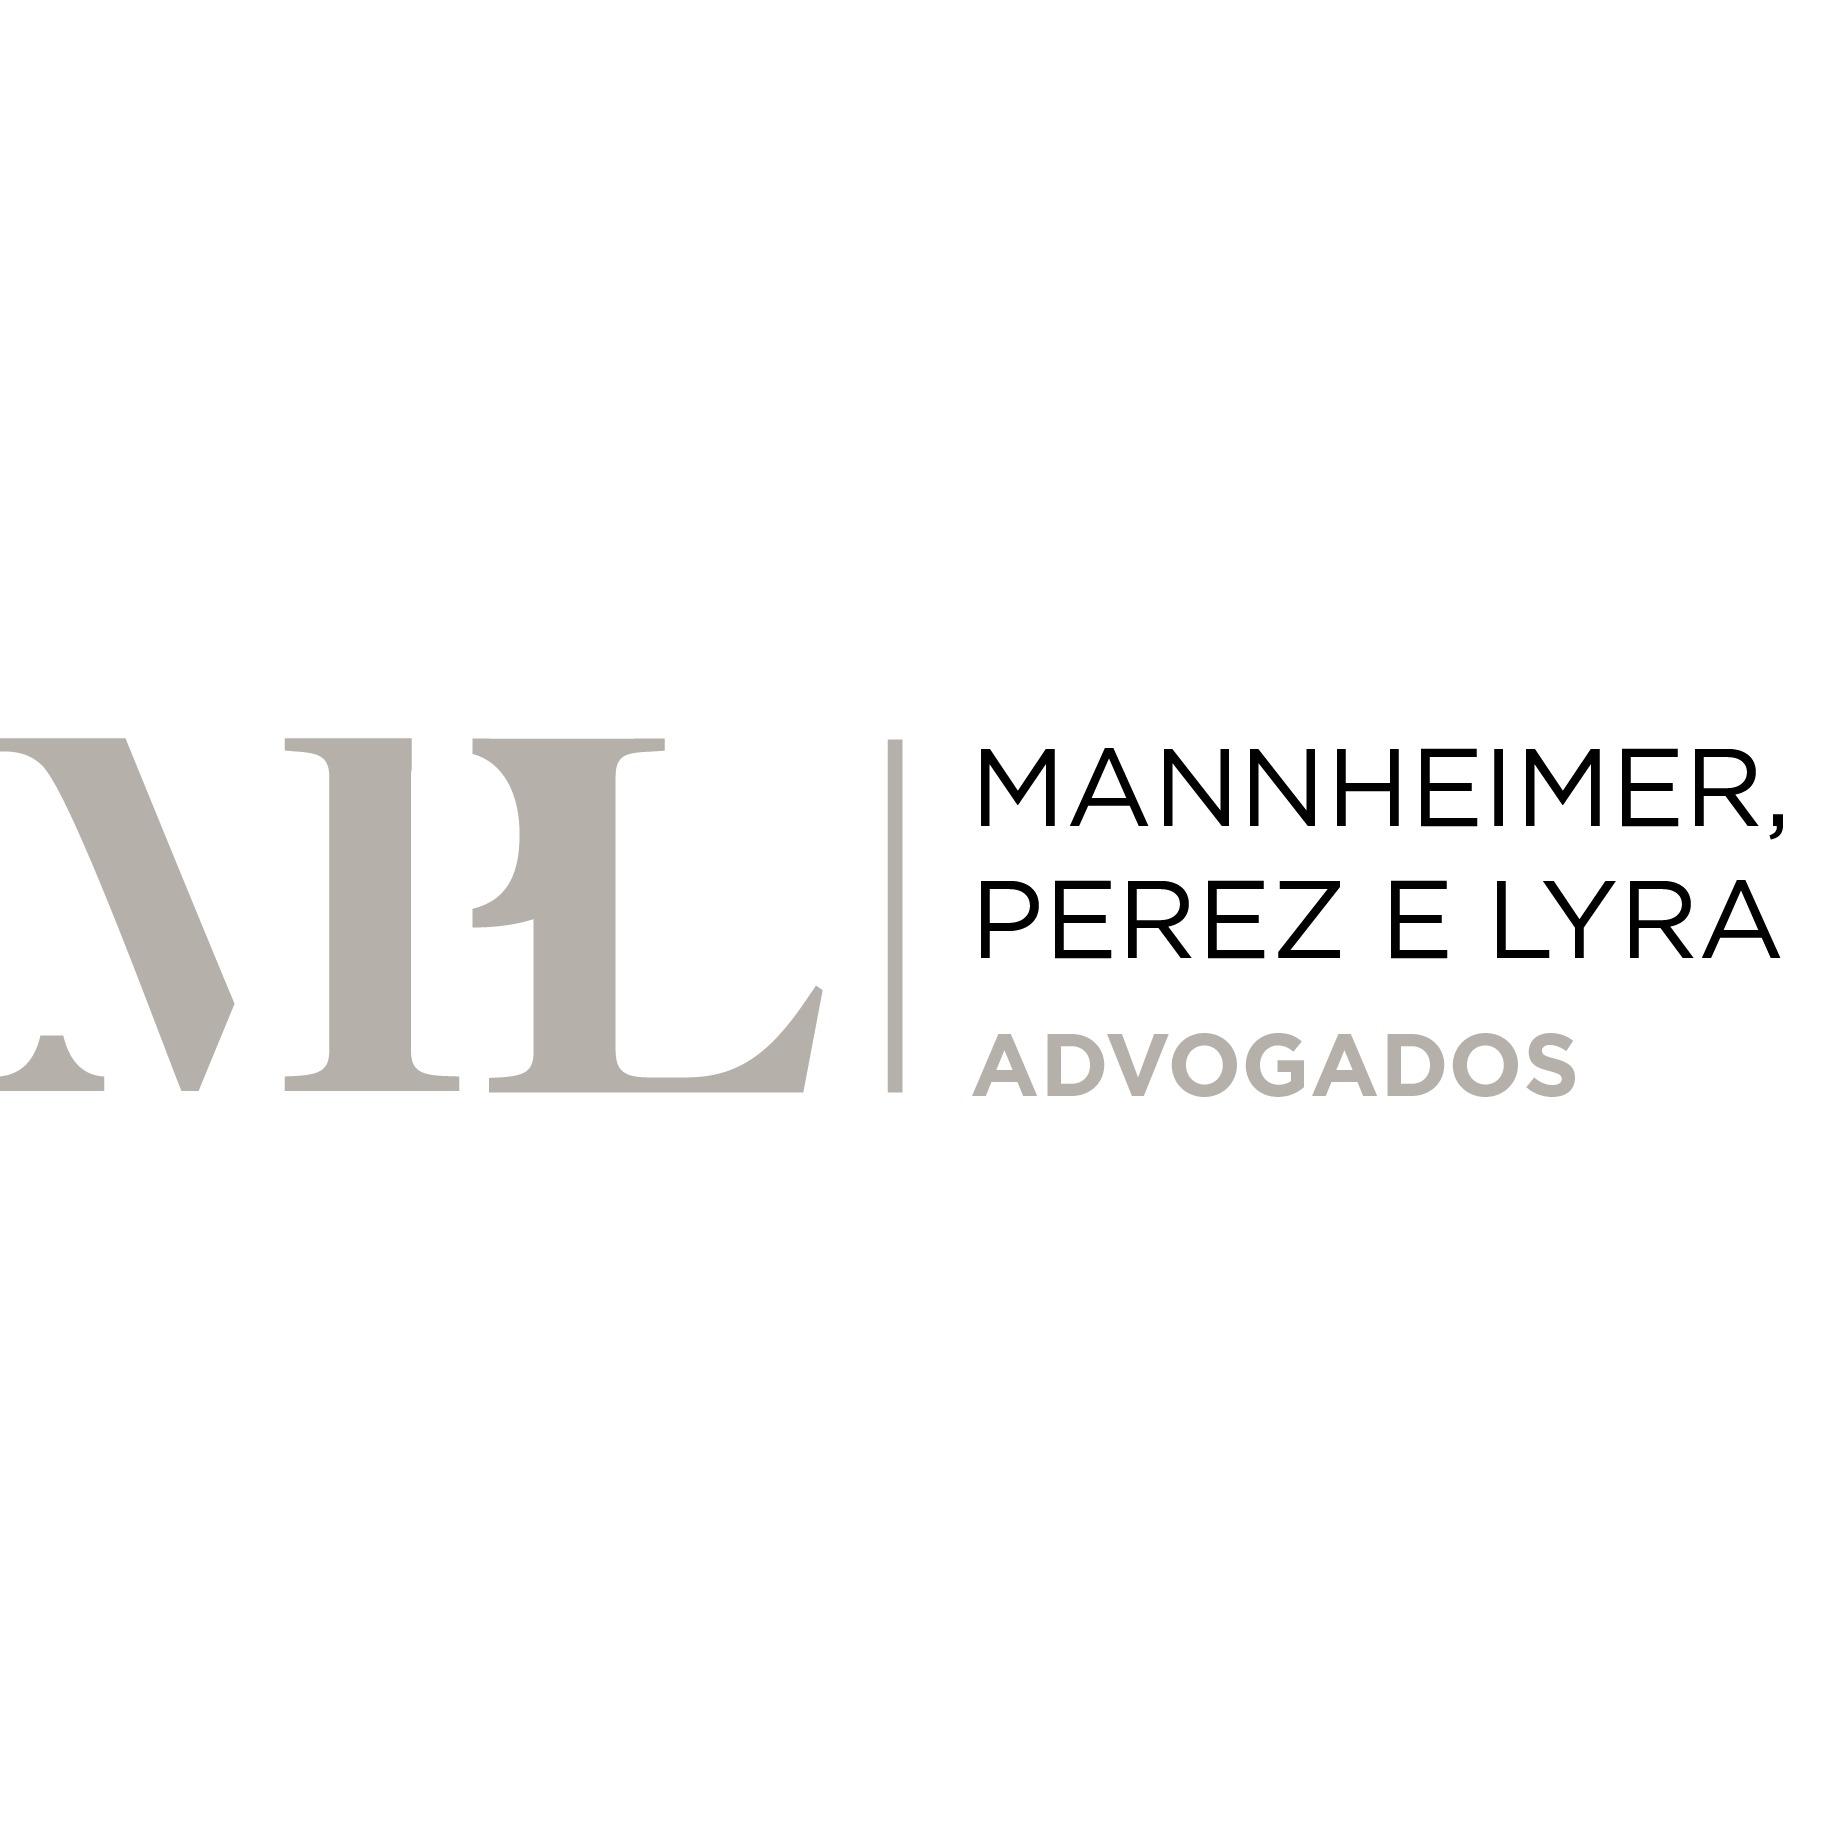 the Mannheimer, Perez e Lyra Advogados logo.